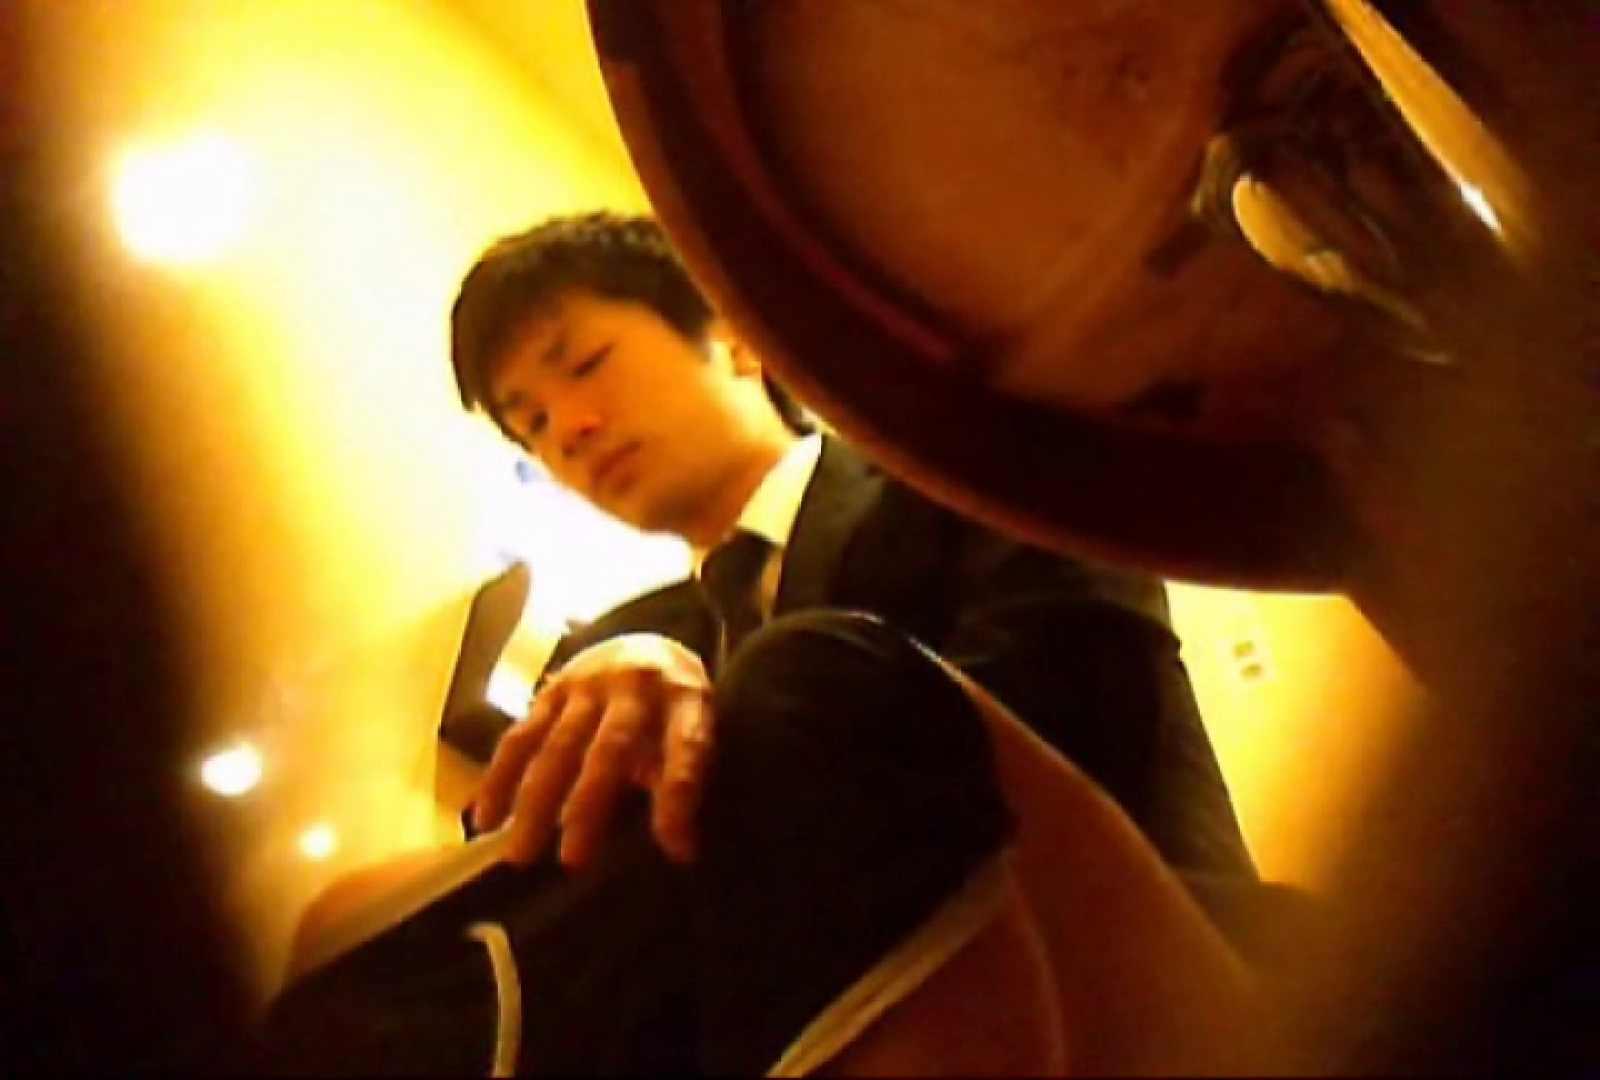 SEASON 3rd!掴み取りさんの洗面所覗き!in新幹線!VOL.23 覗きシーン ゲイエロ動画 96枚 94